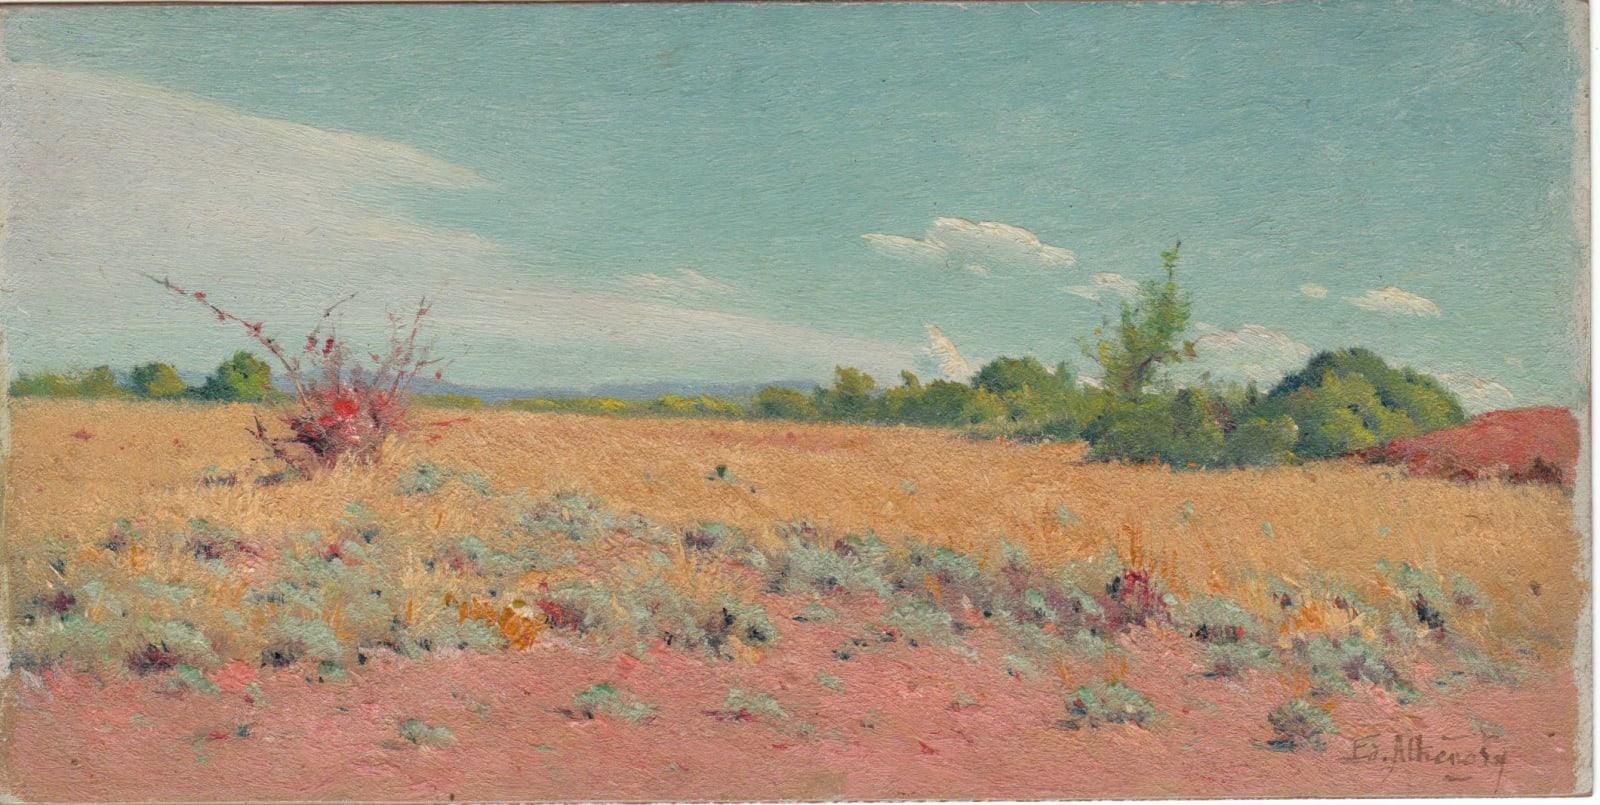 EDOUARD ATHÉNOSY, La Lande en plein soleil, c. 1919